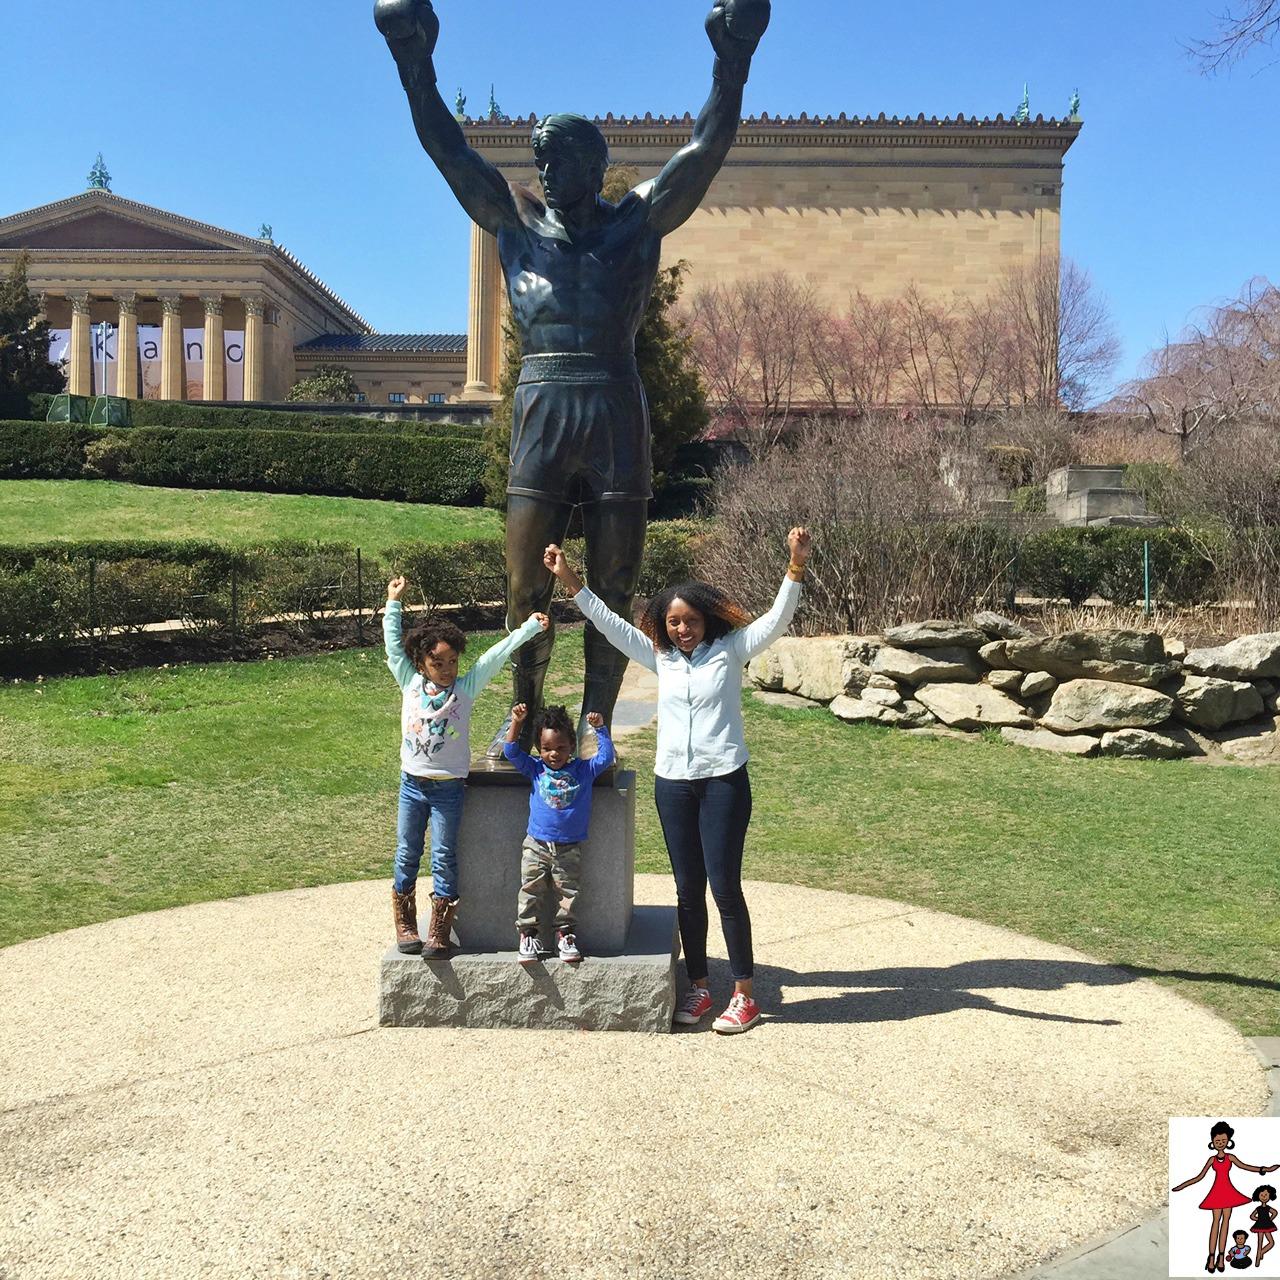 rocky-statue-kids